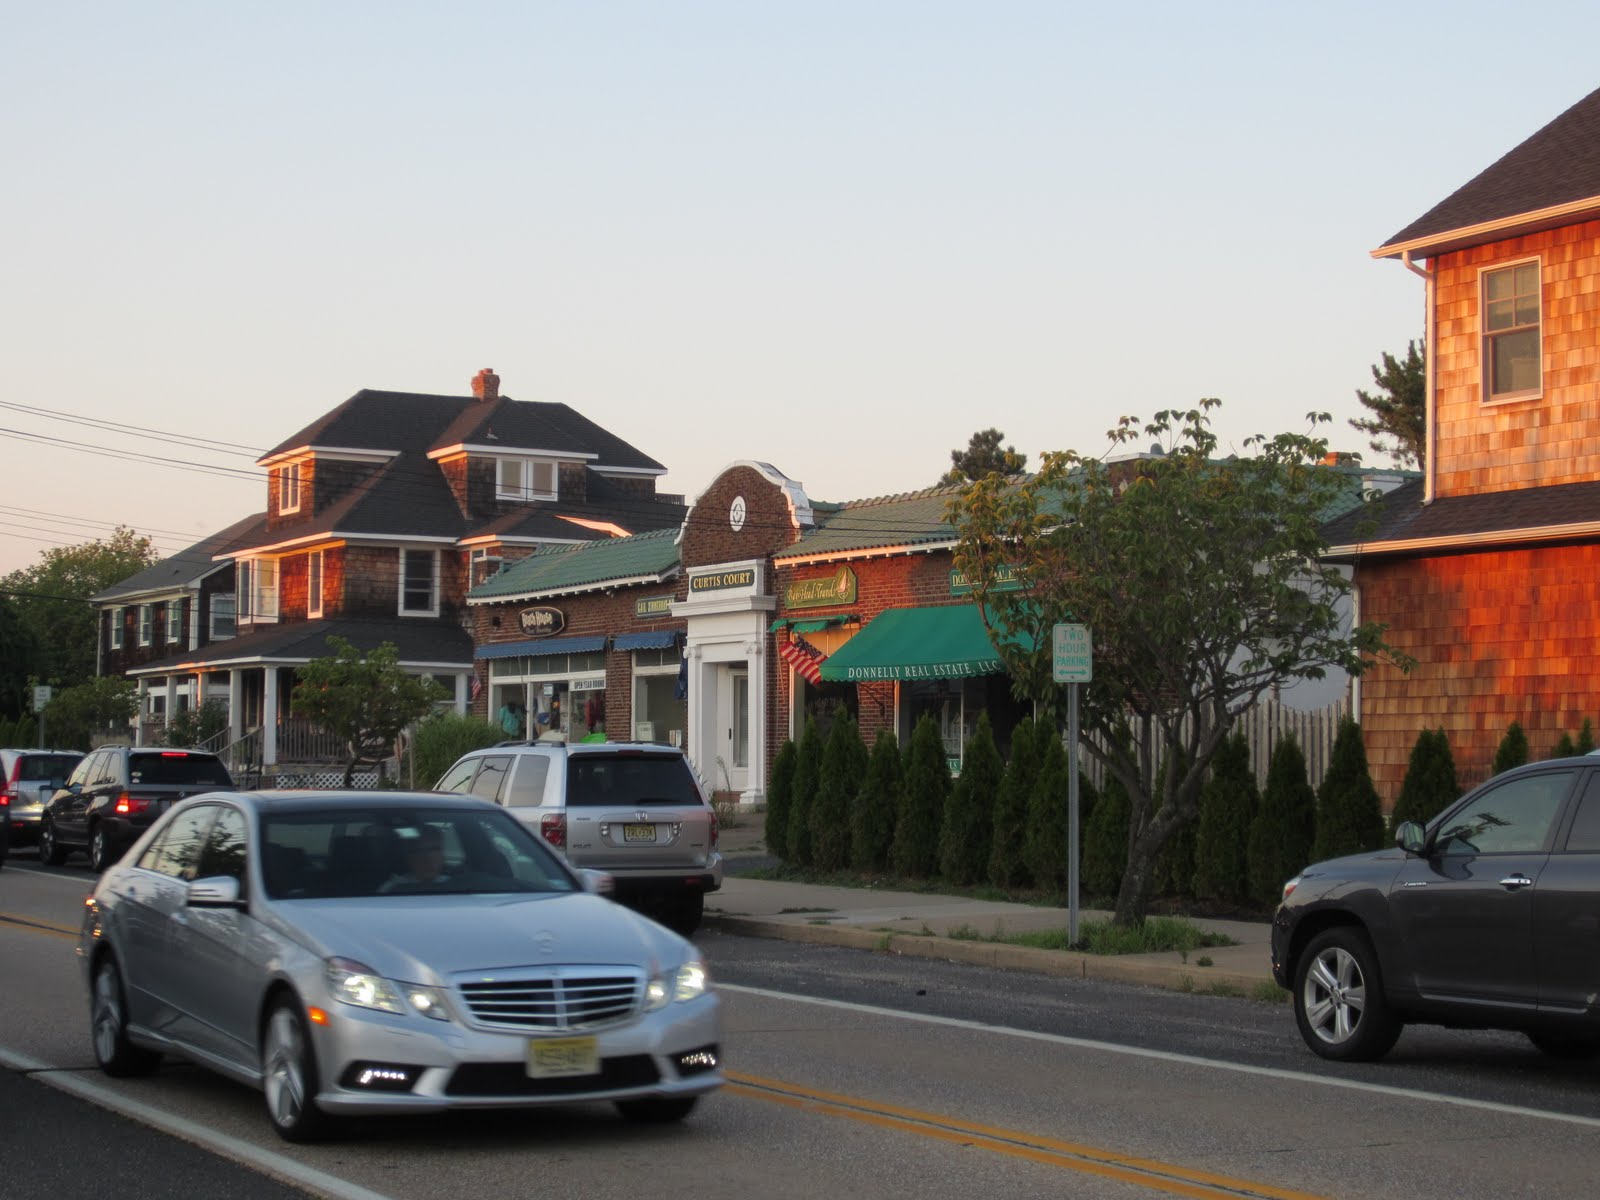 Streets of Bayhead, NJ - Jersey Shore